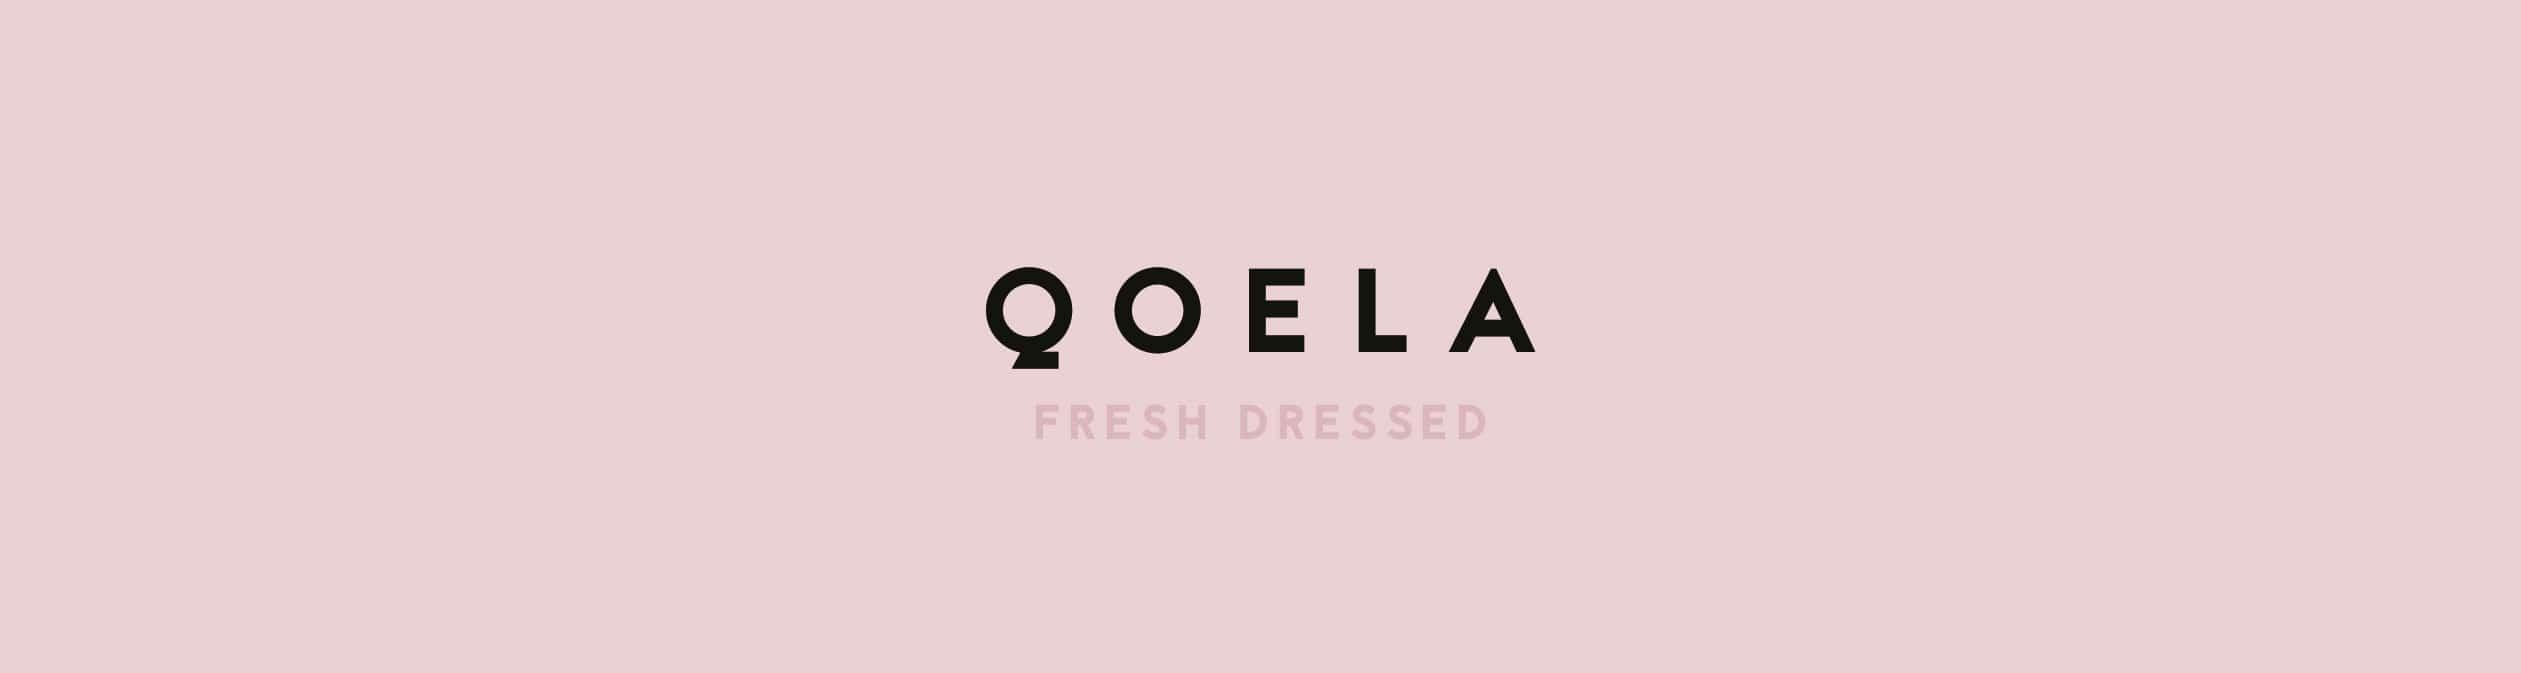 QOELA-02